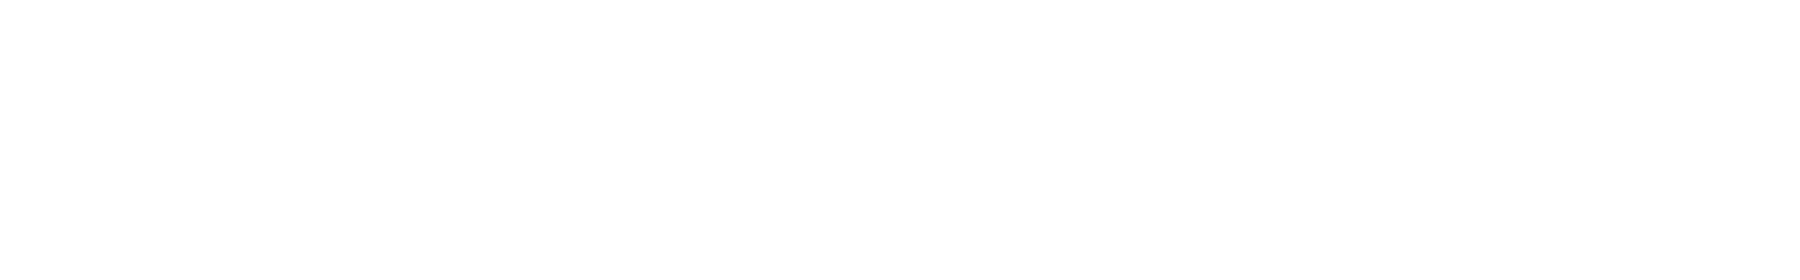 vedh melodyloop 104 f c dm b 120bpm